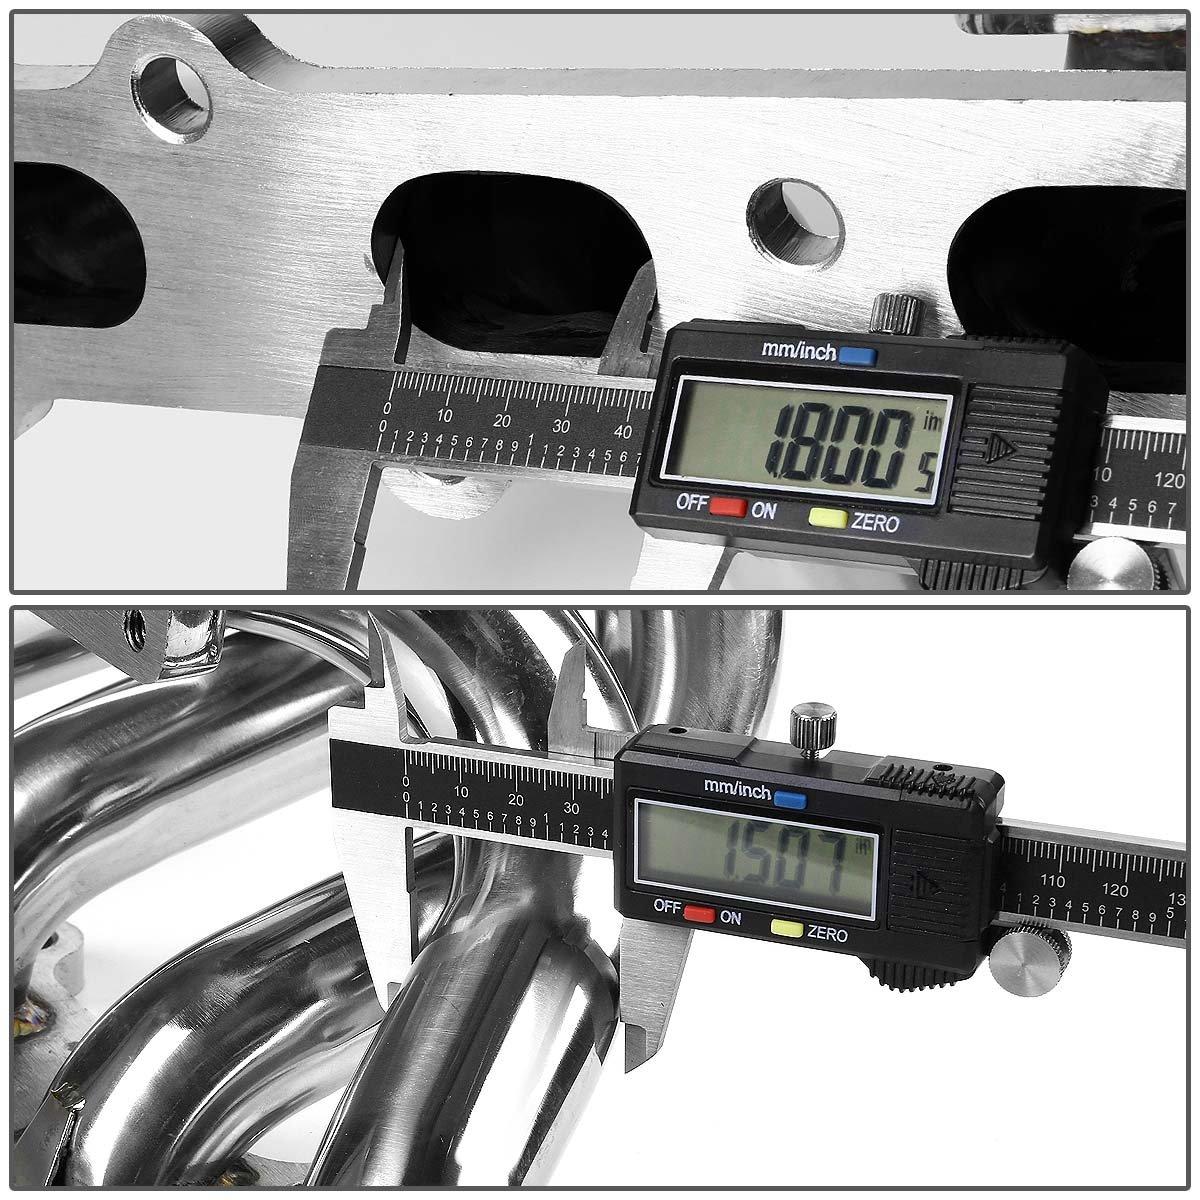 Mazda Miata MX5 1,8 acero inoxidable T25/T28 montaje superior Turbo colector: Amazon.es: Coche y moto